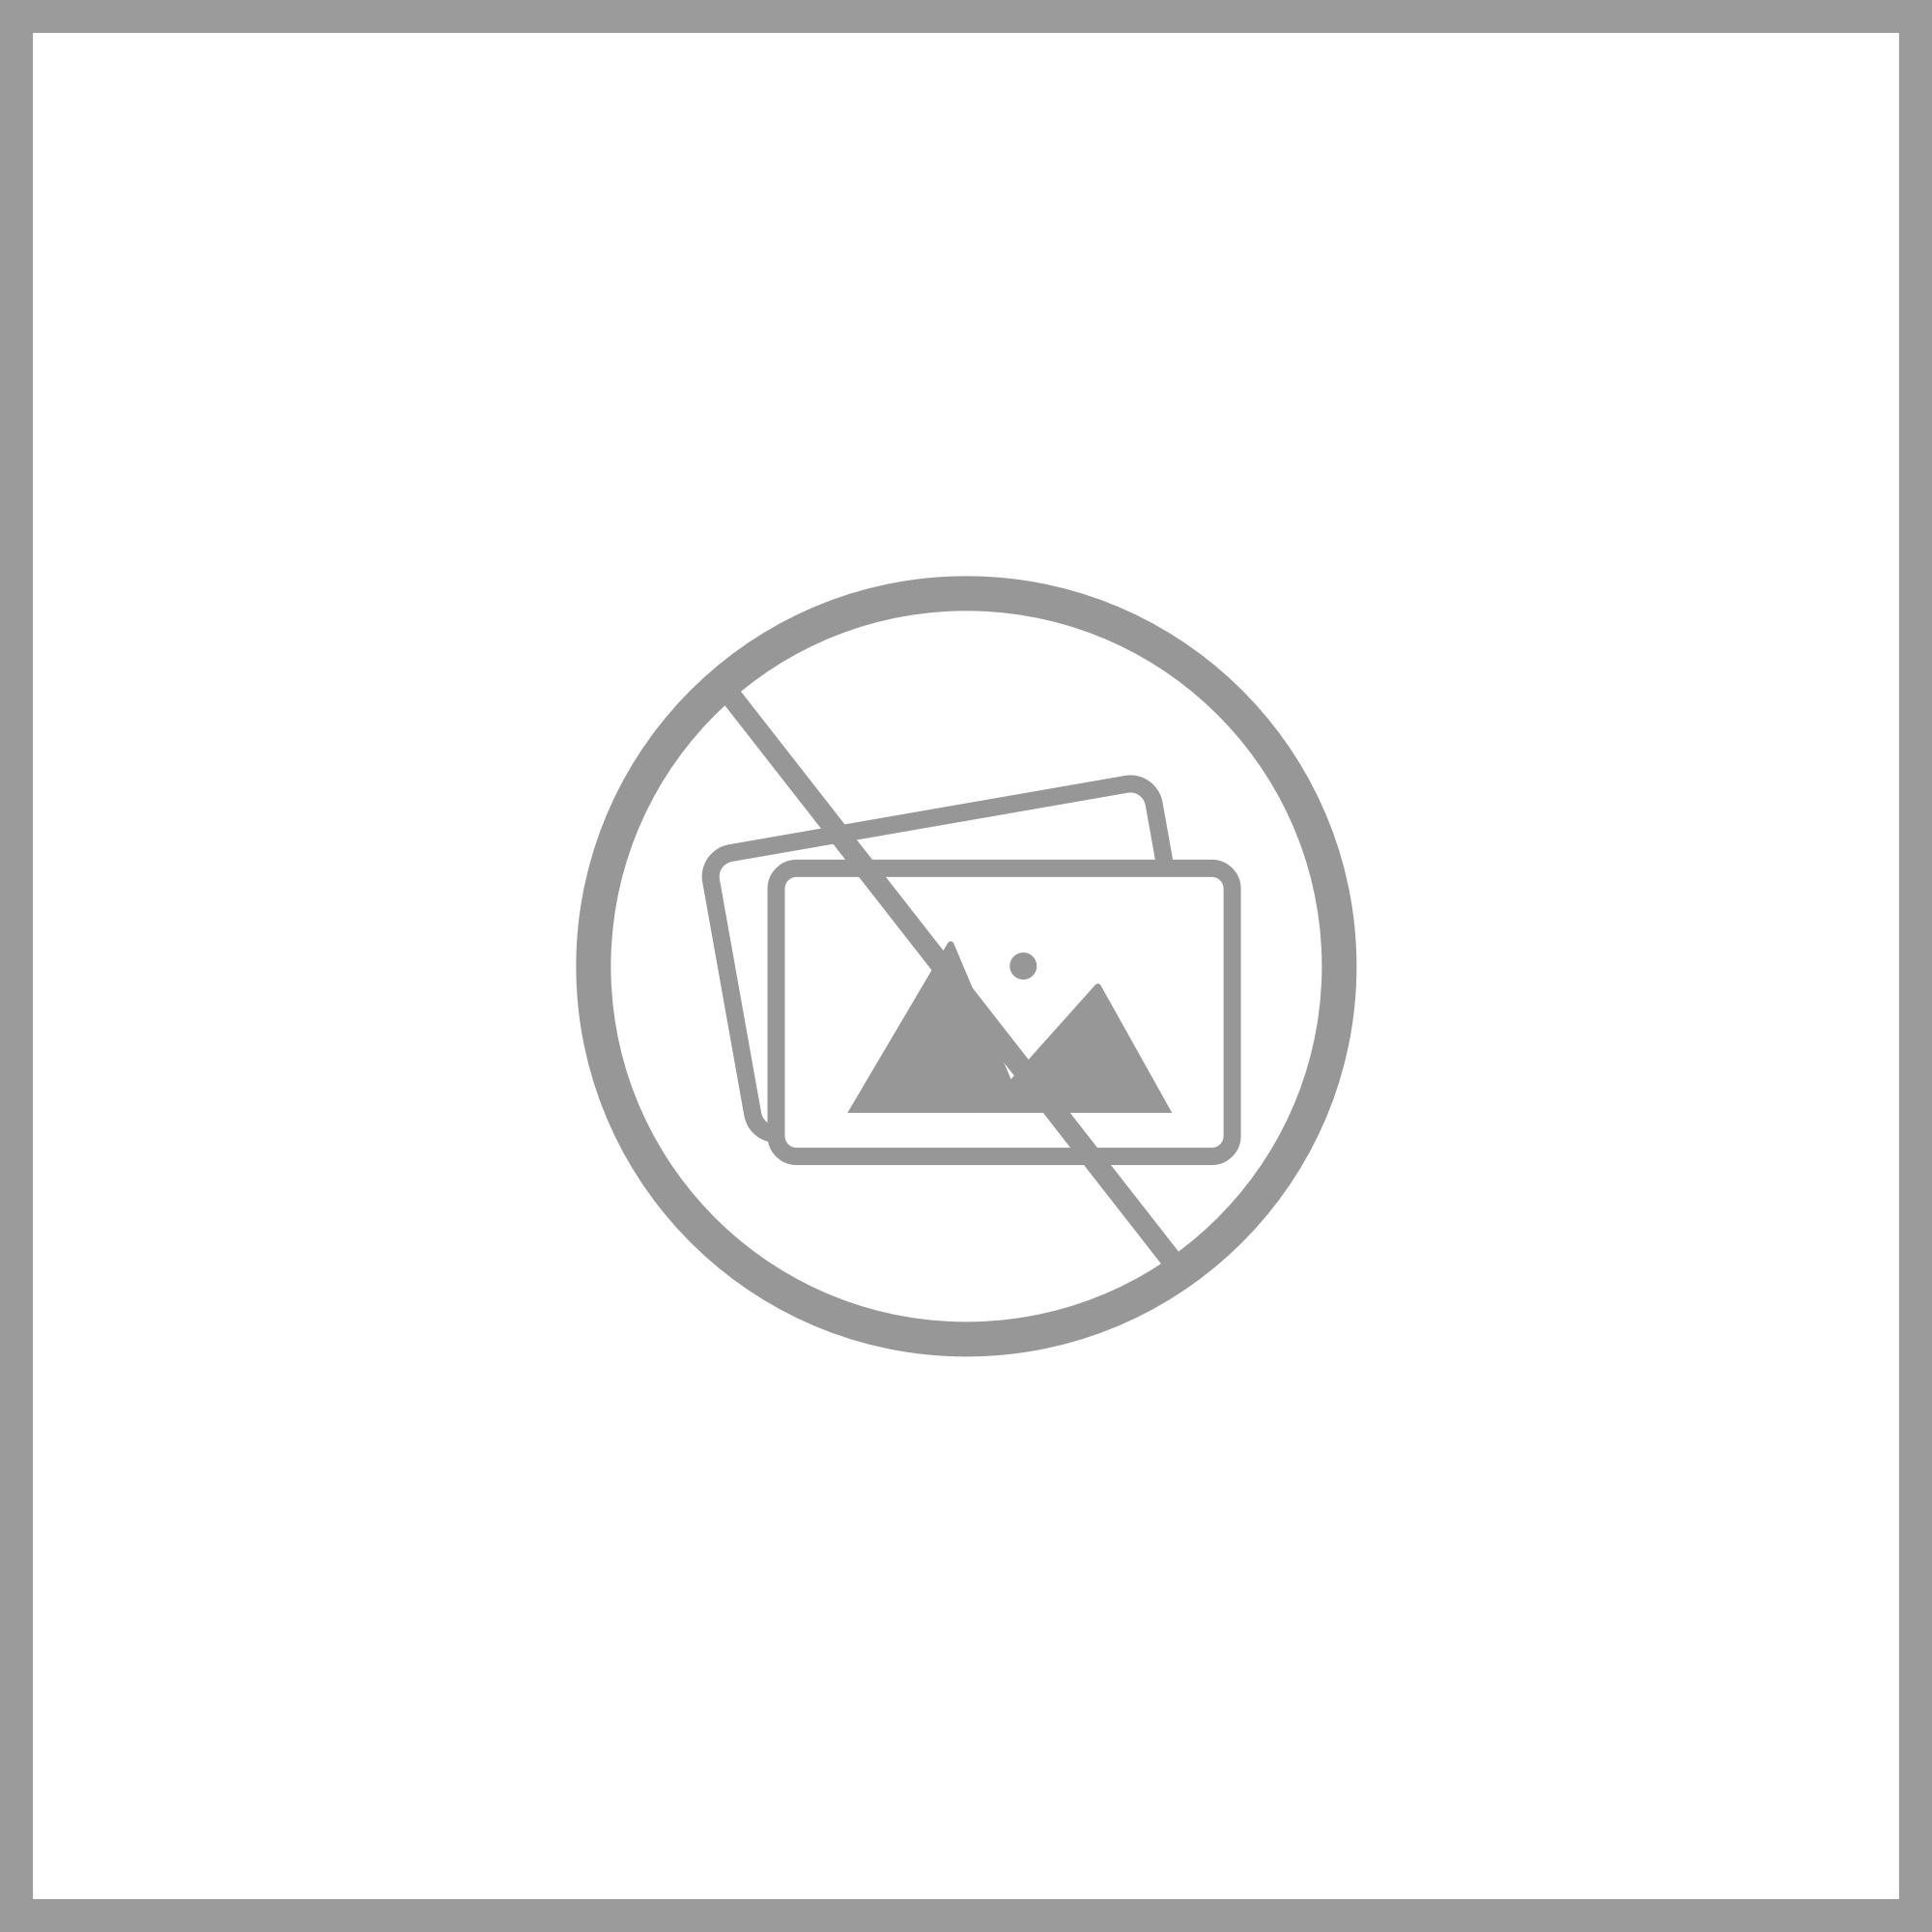 Plumbsure Chrome effect Vent & blanking plug